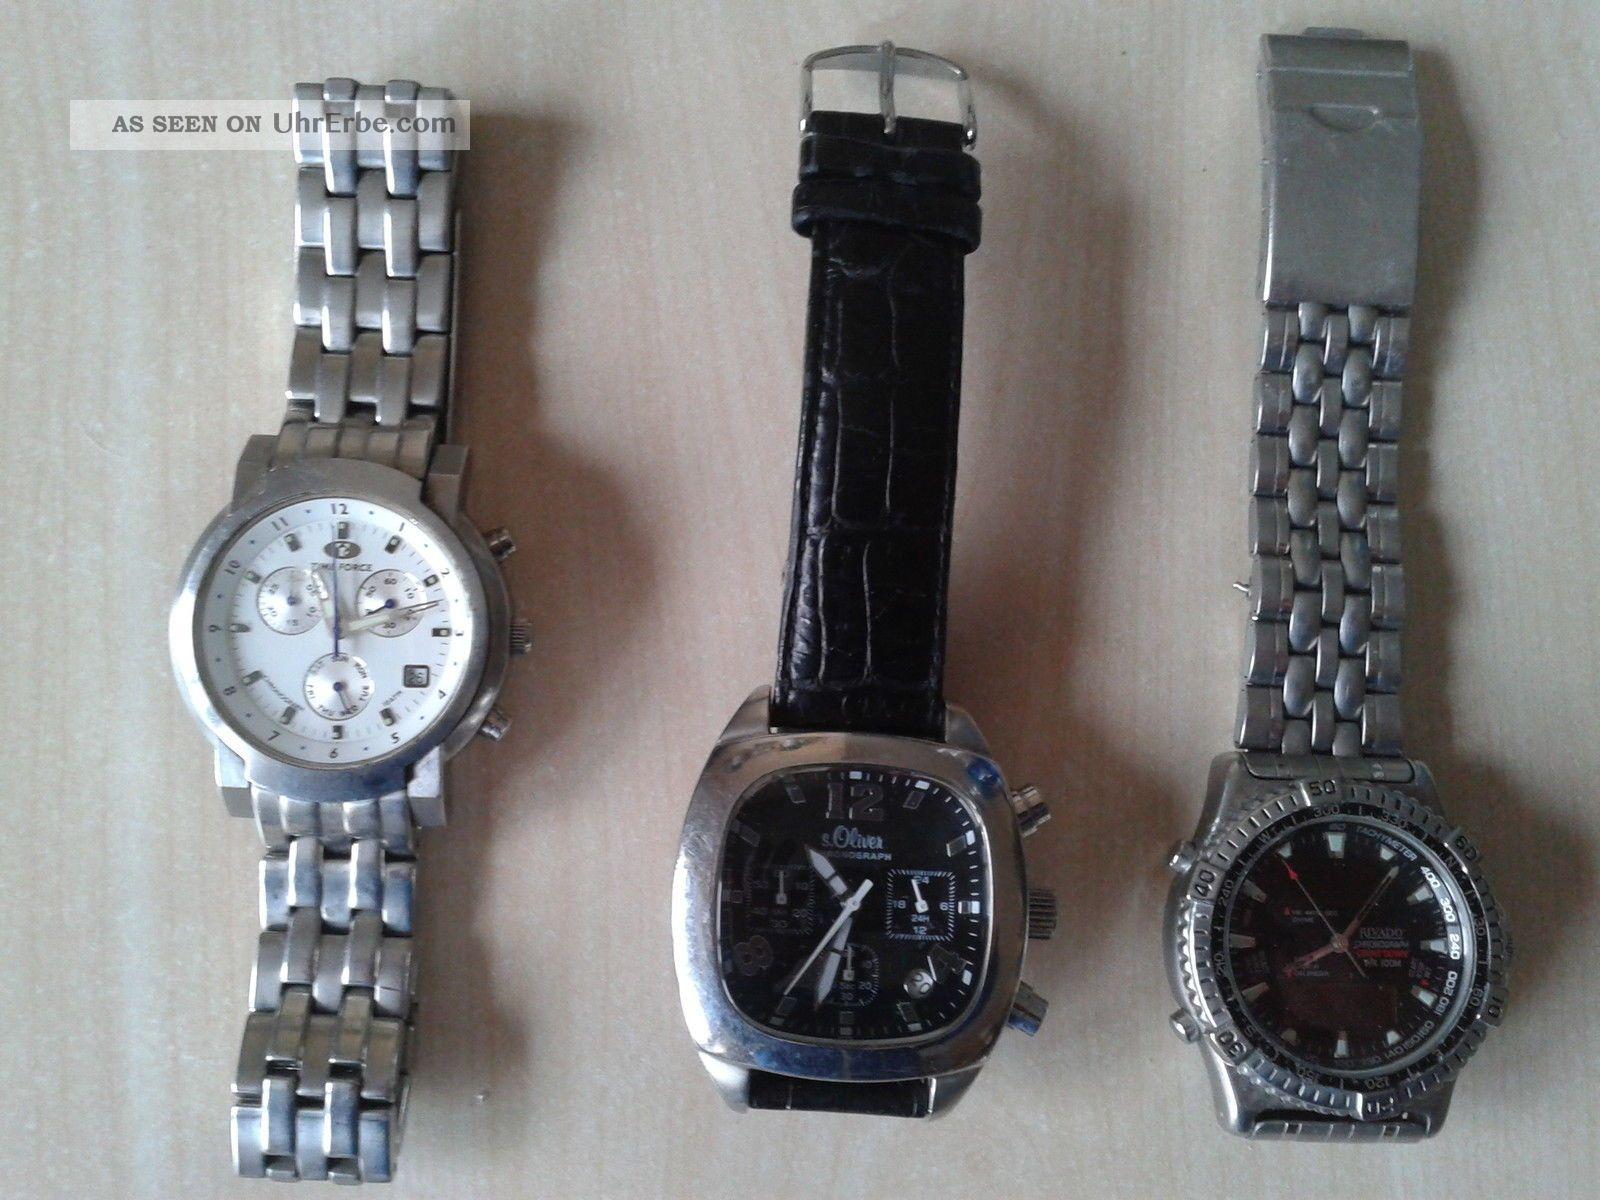 3x Uhr,  Chronograph,  S Oliver,  Rivado,  Timeforce,  Water Resistant Armbanduhren Bild